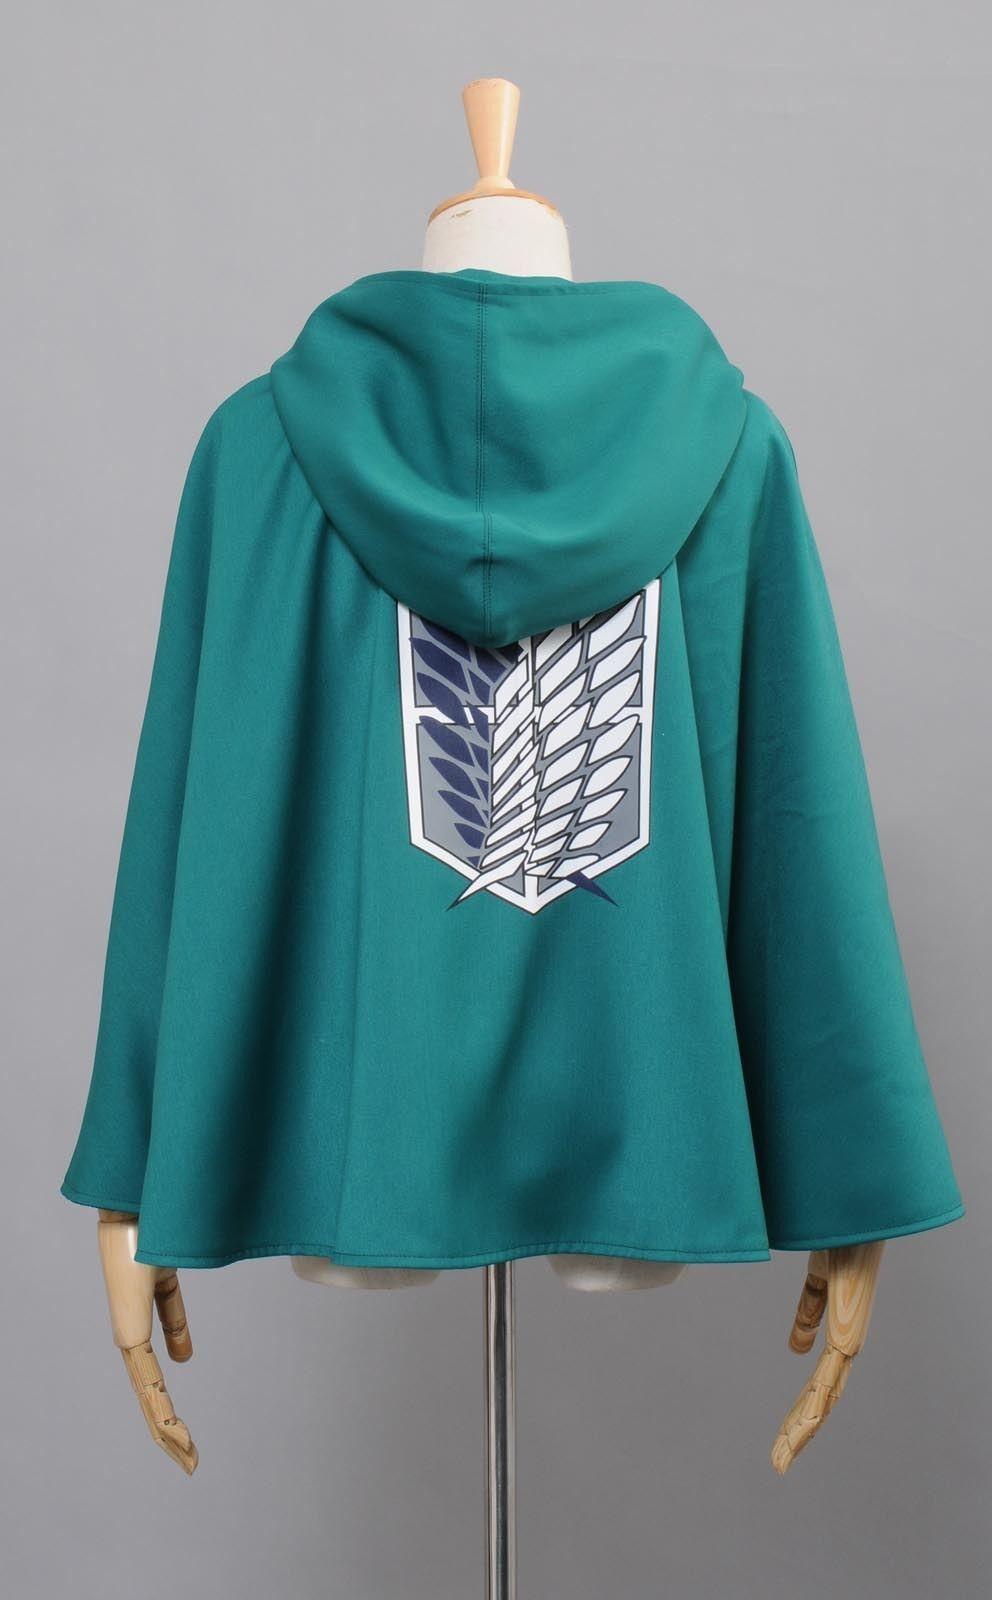 Romantic Attack On Titan Shingeki No Kyojin Hoodie Black Green Jacket Costume Uk Seller Clothing, Shoes & Accessories